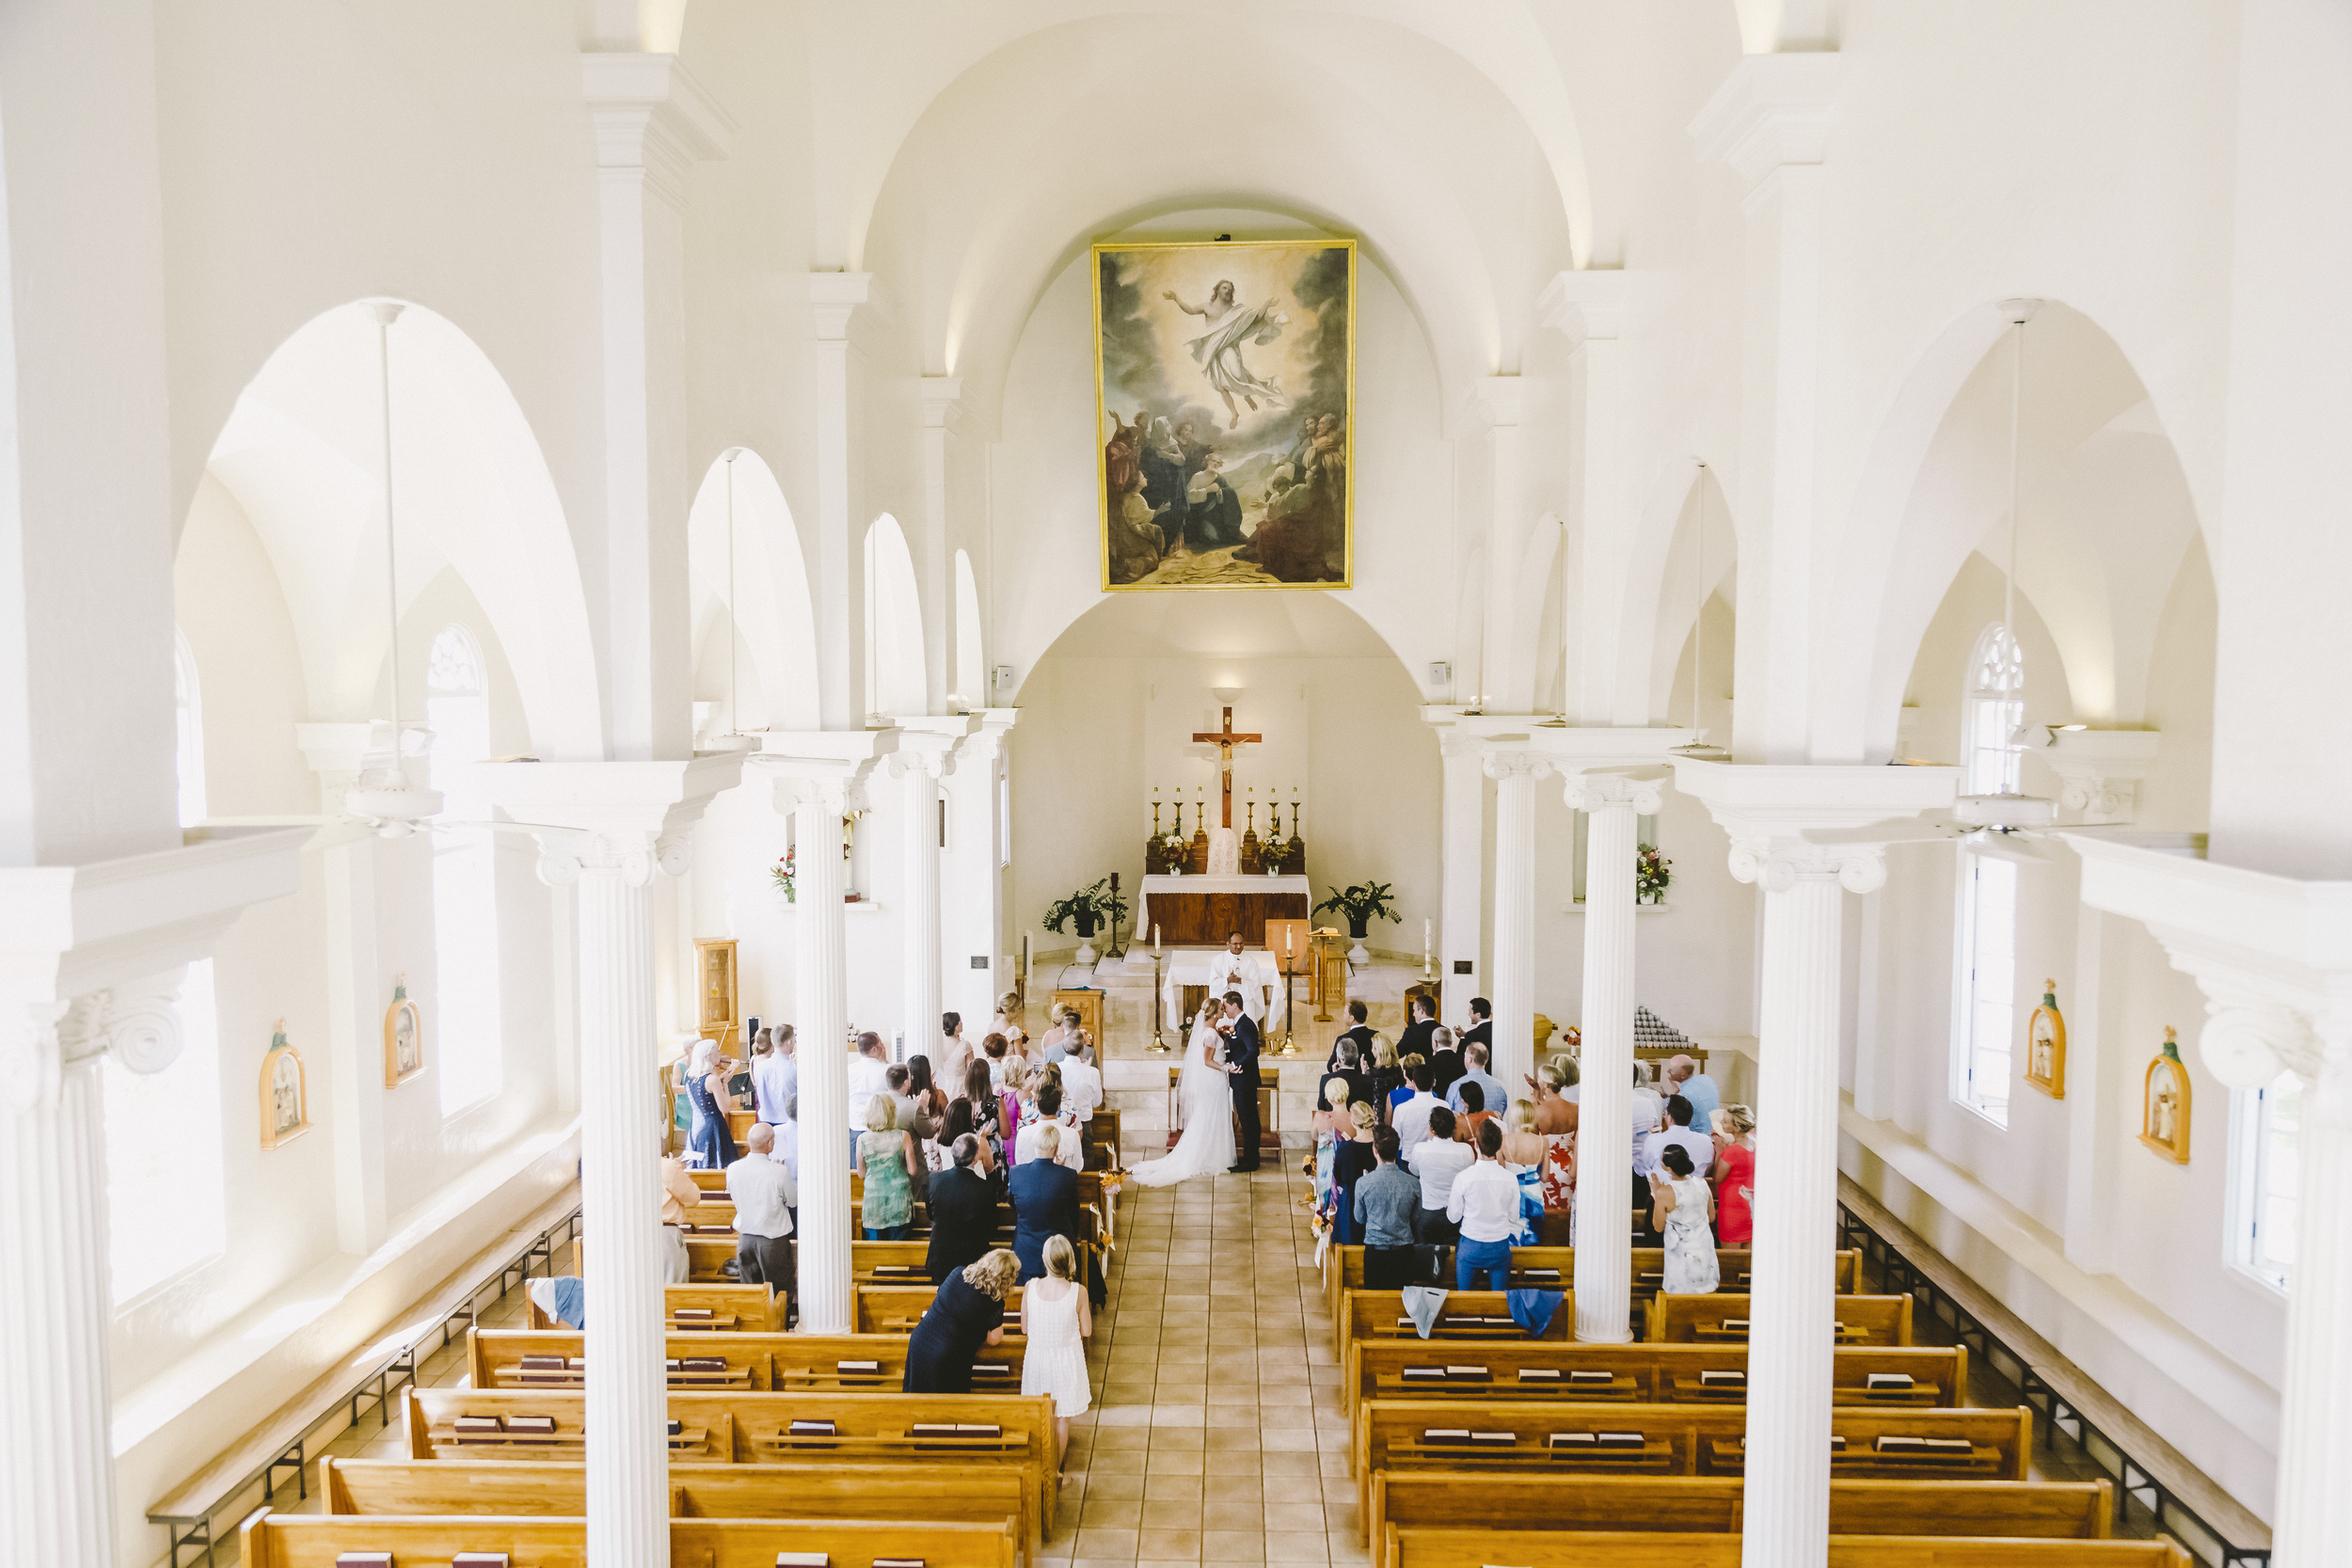 angie-diaz-photography-maui-wedding-mel-matt-43.jpeg